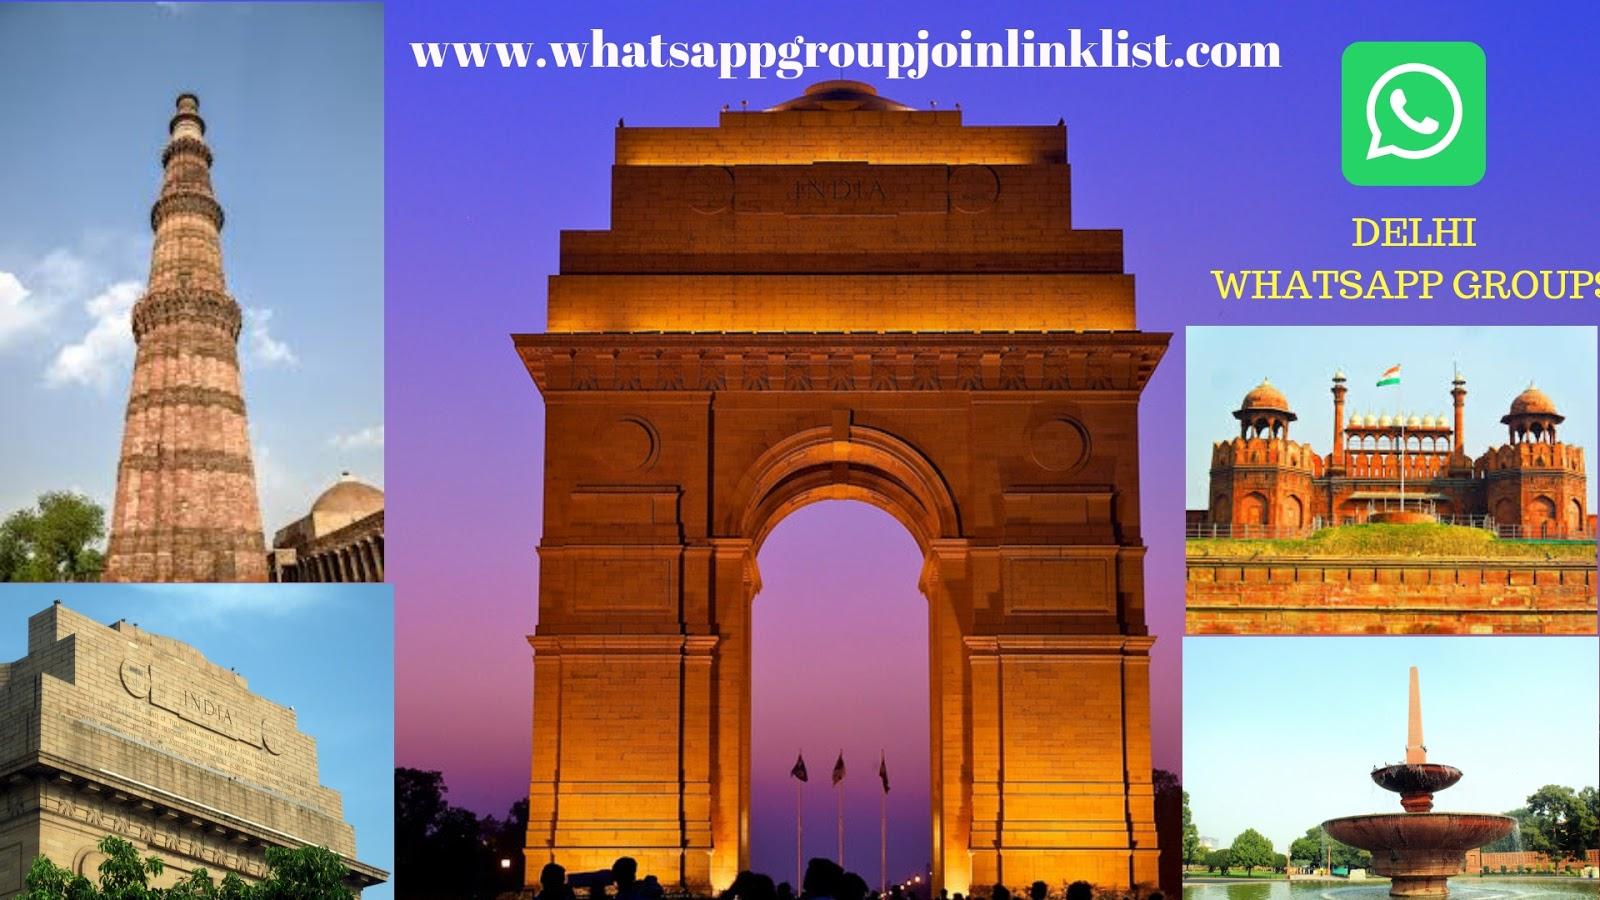 ⚡ Delhi whatsapp group link   New Jobs WhatsApp Group Links! Join